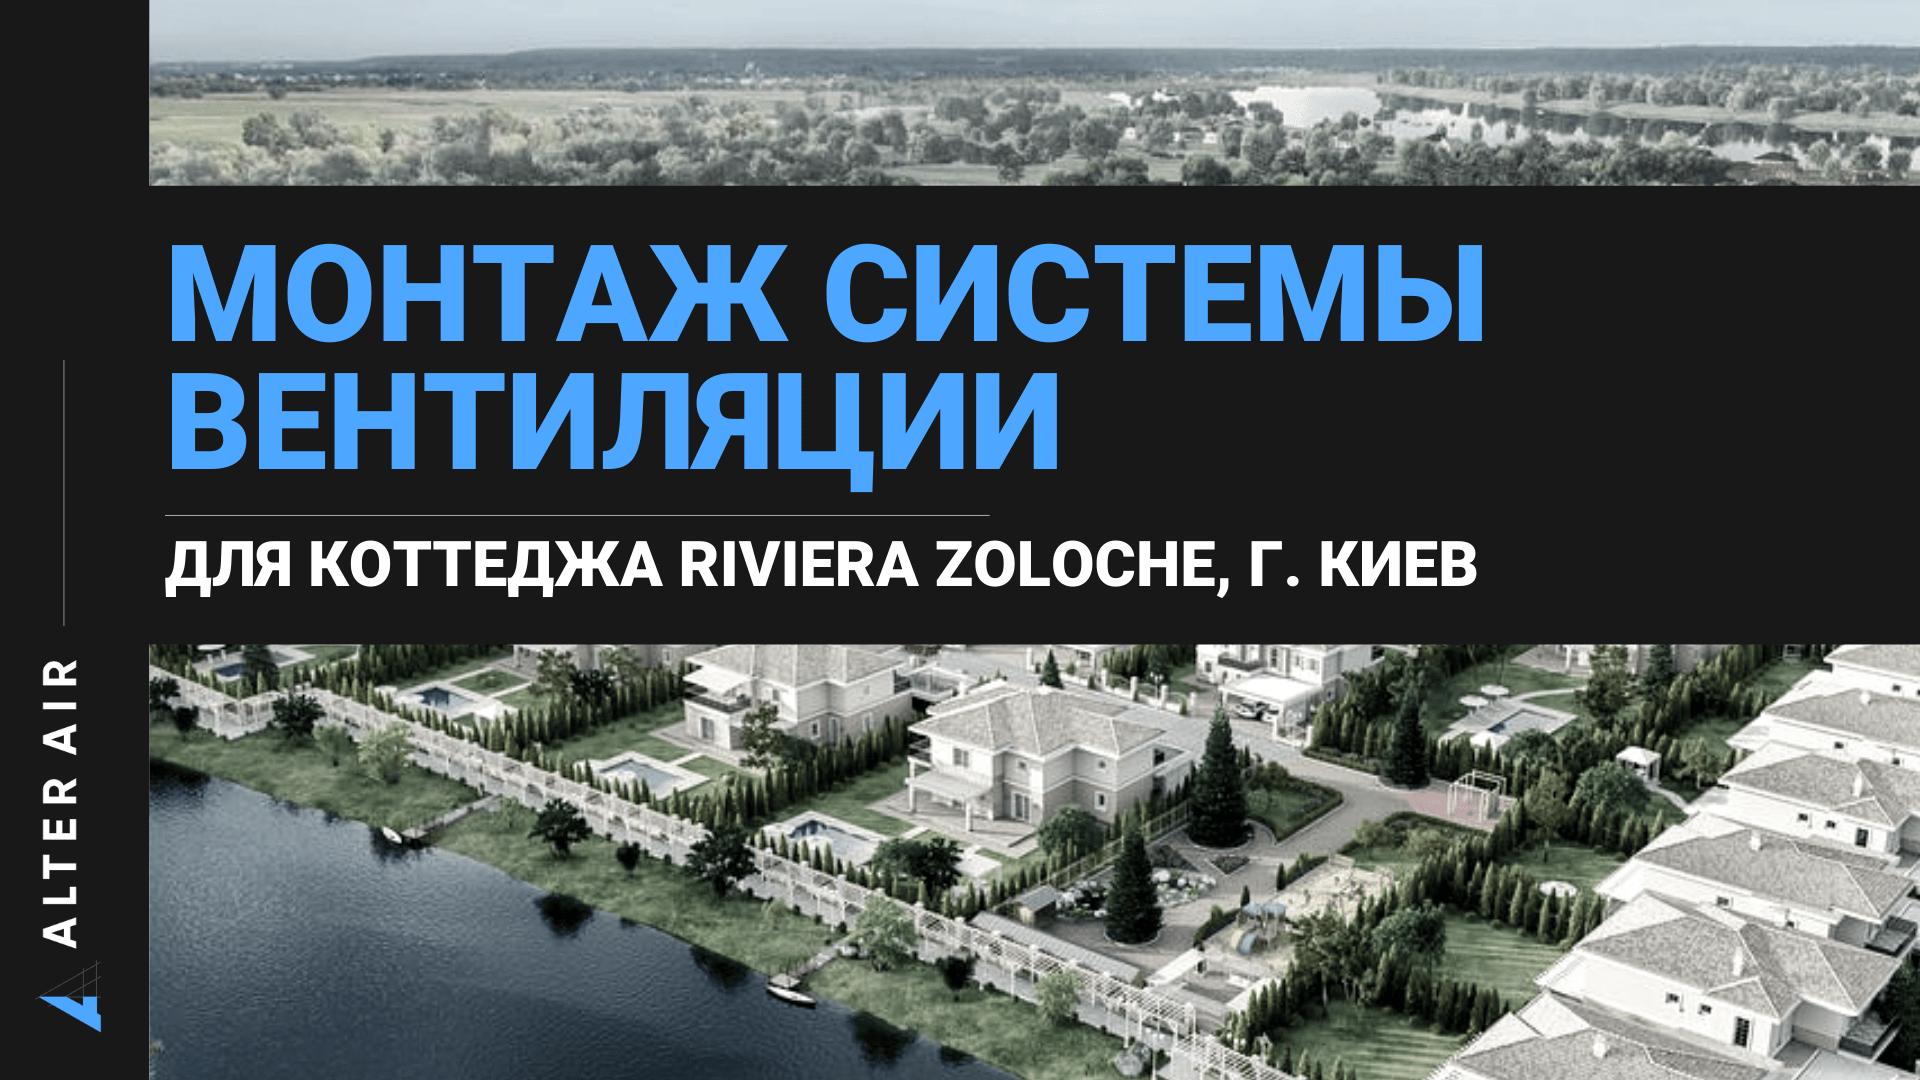 Видео с объекта коттеджный городок «Riviera Zoloche»